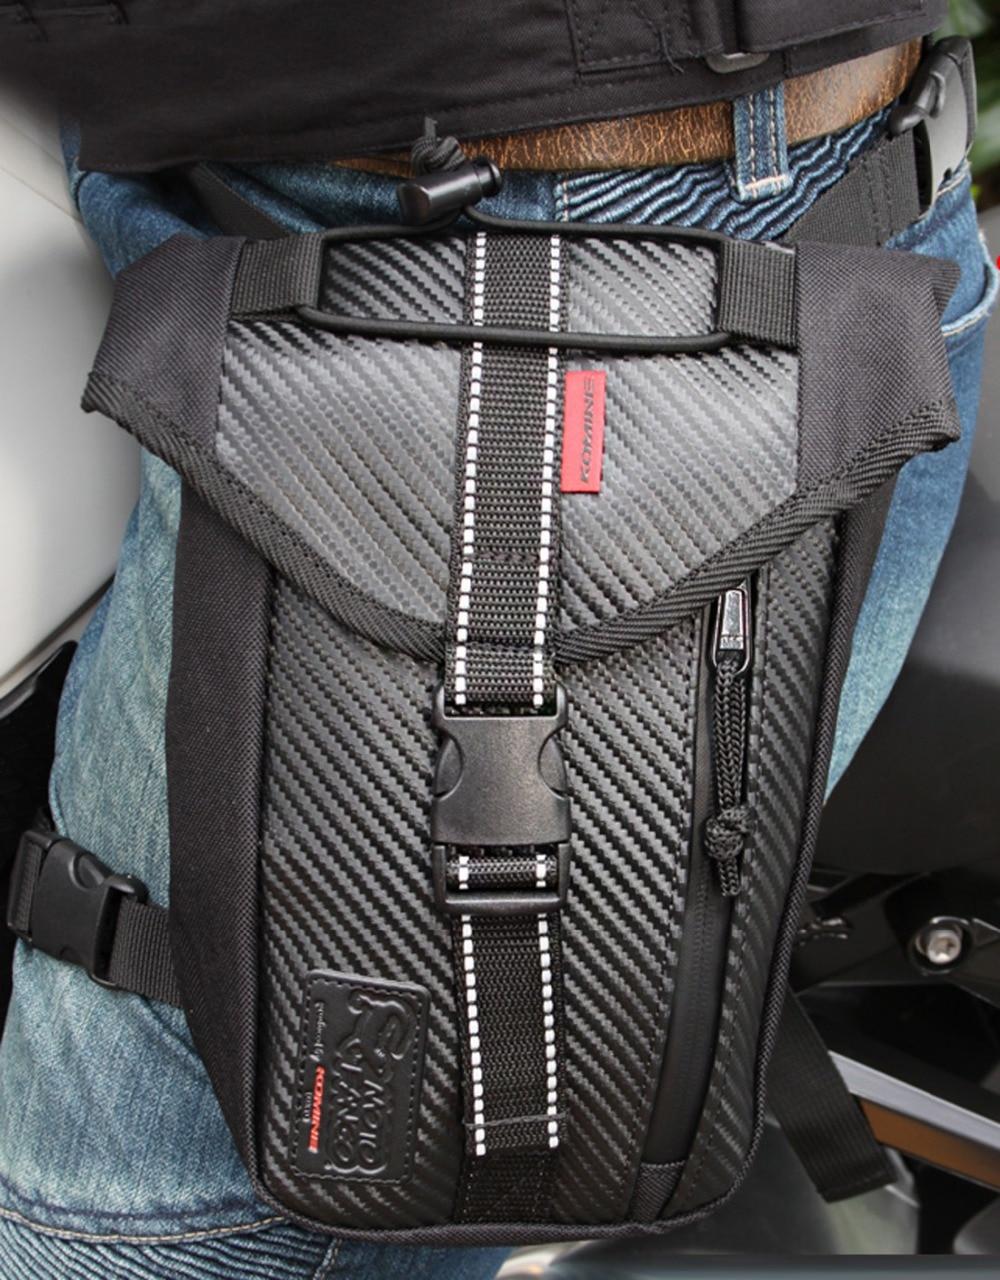 Herre Vandtæt Drop Leg Bag Multi-Purse Fanny Pack Talje Lår Hip Bum Bælte Motorcykel Military Tactical for Travel Ridning Bag